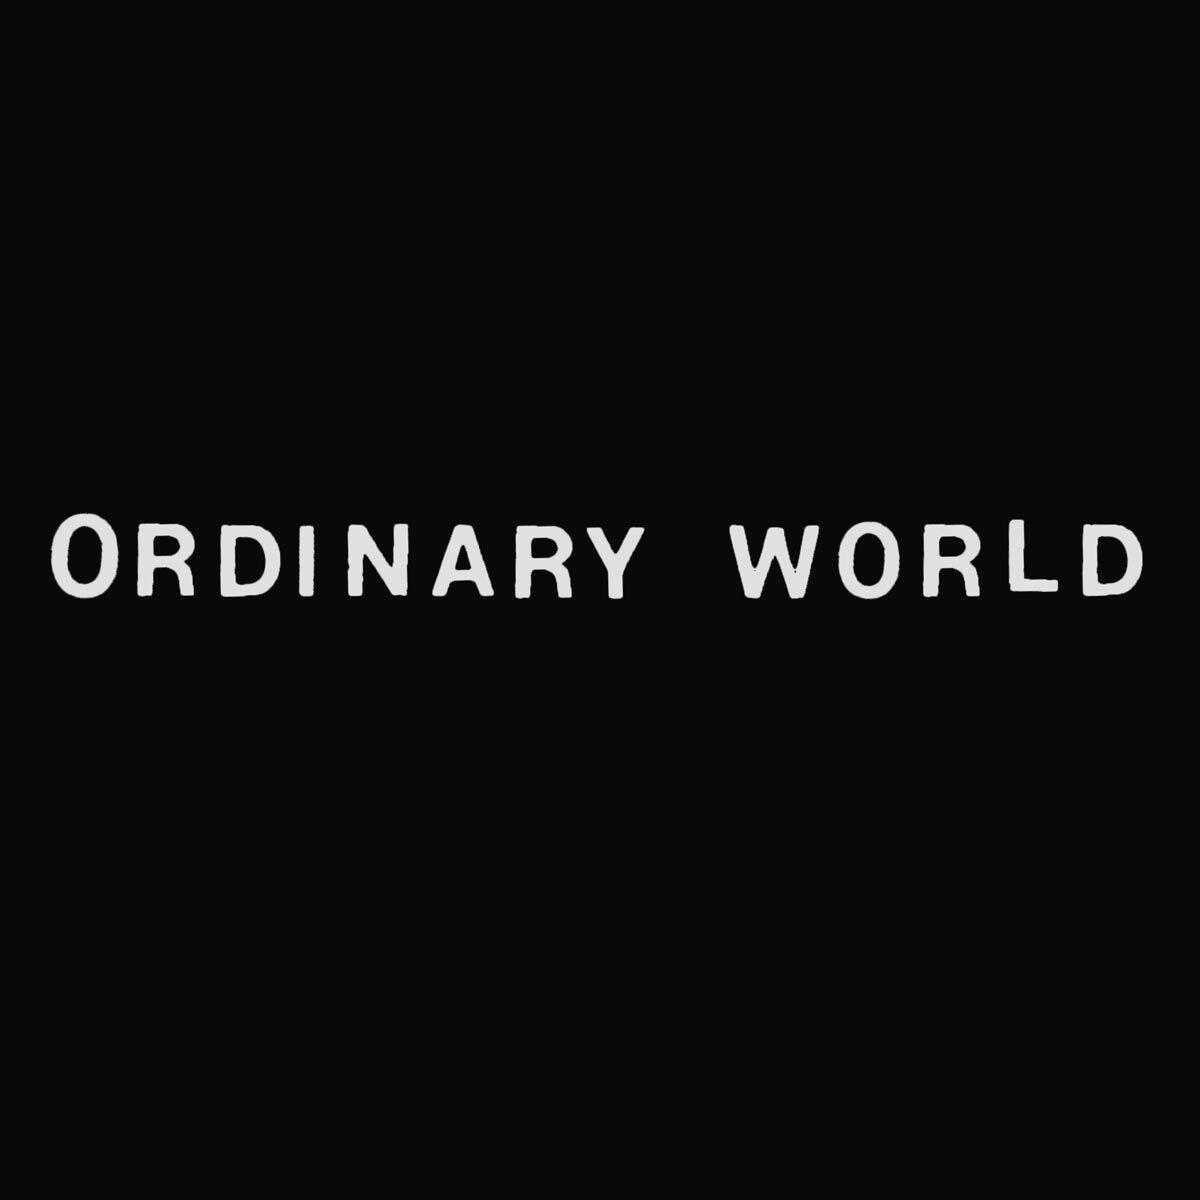 ORDINARY WORLD shirt